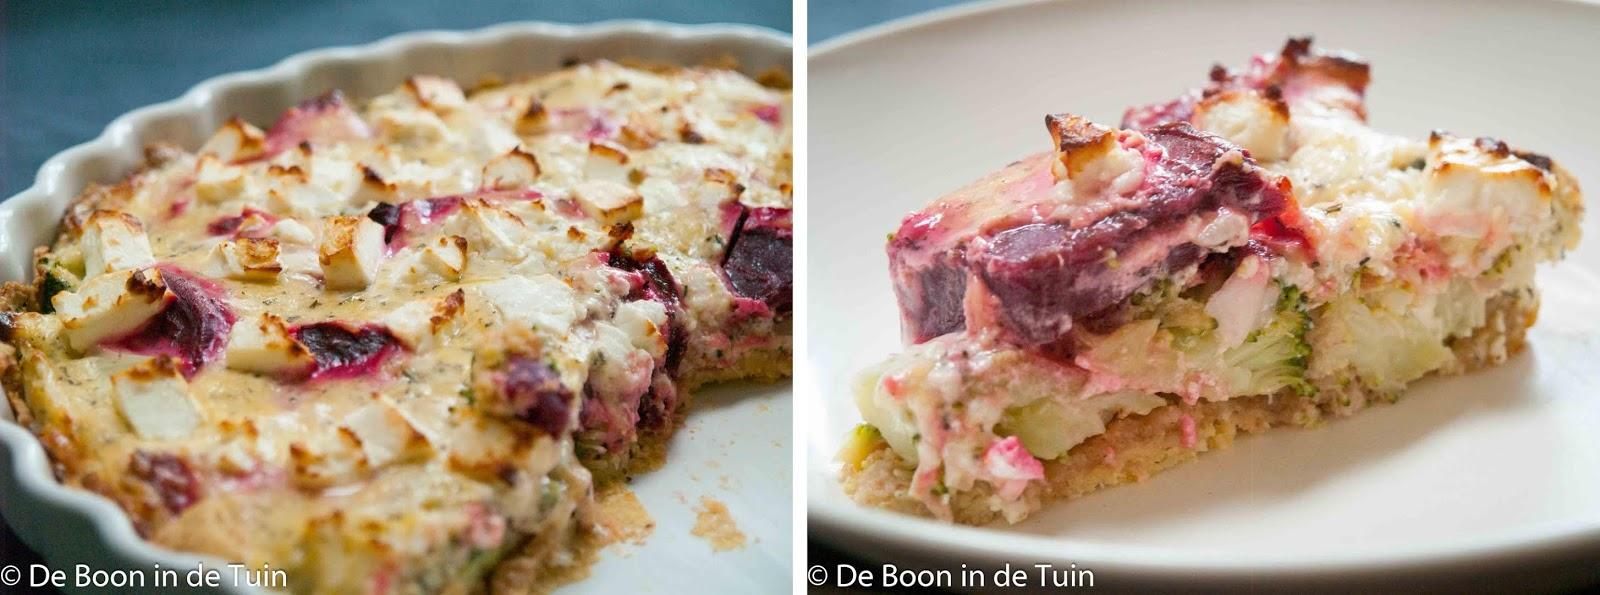 recept quiche rode biet kikkererwten feta glutenvrij vegetarisch